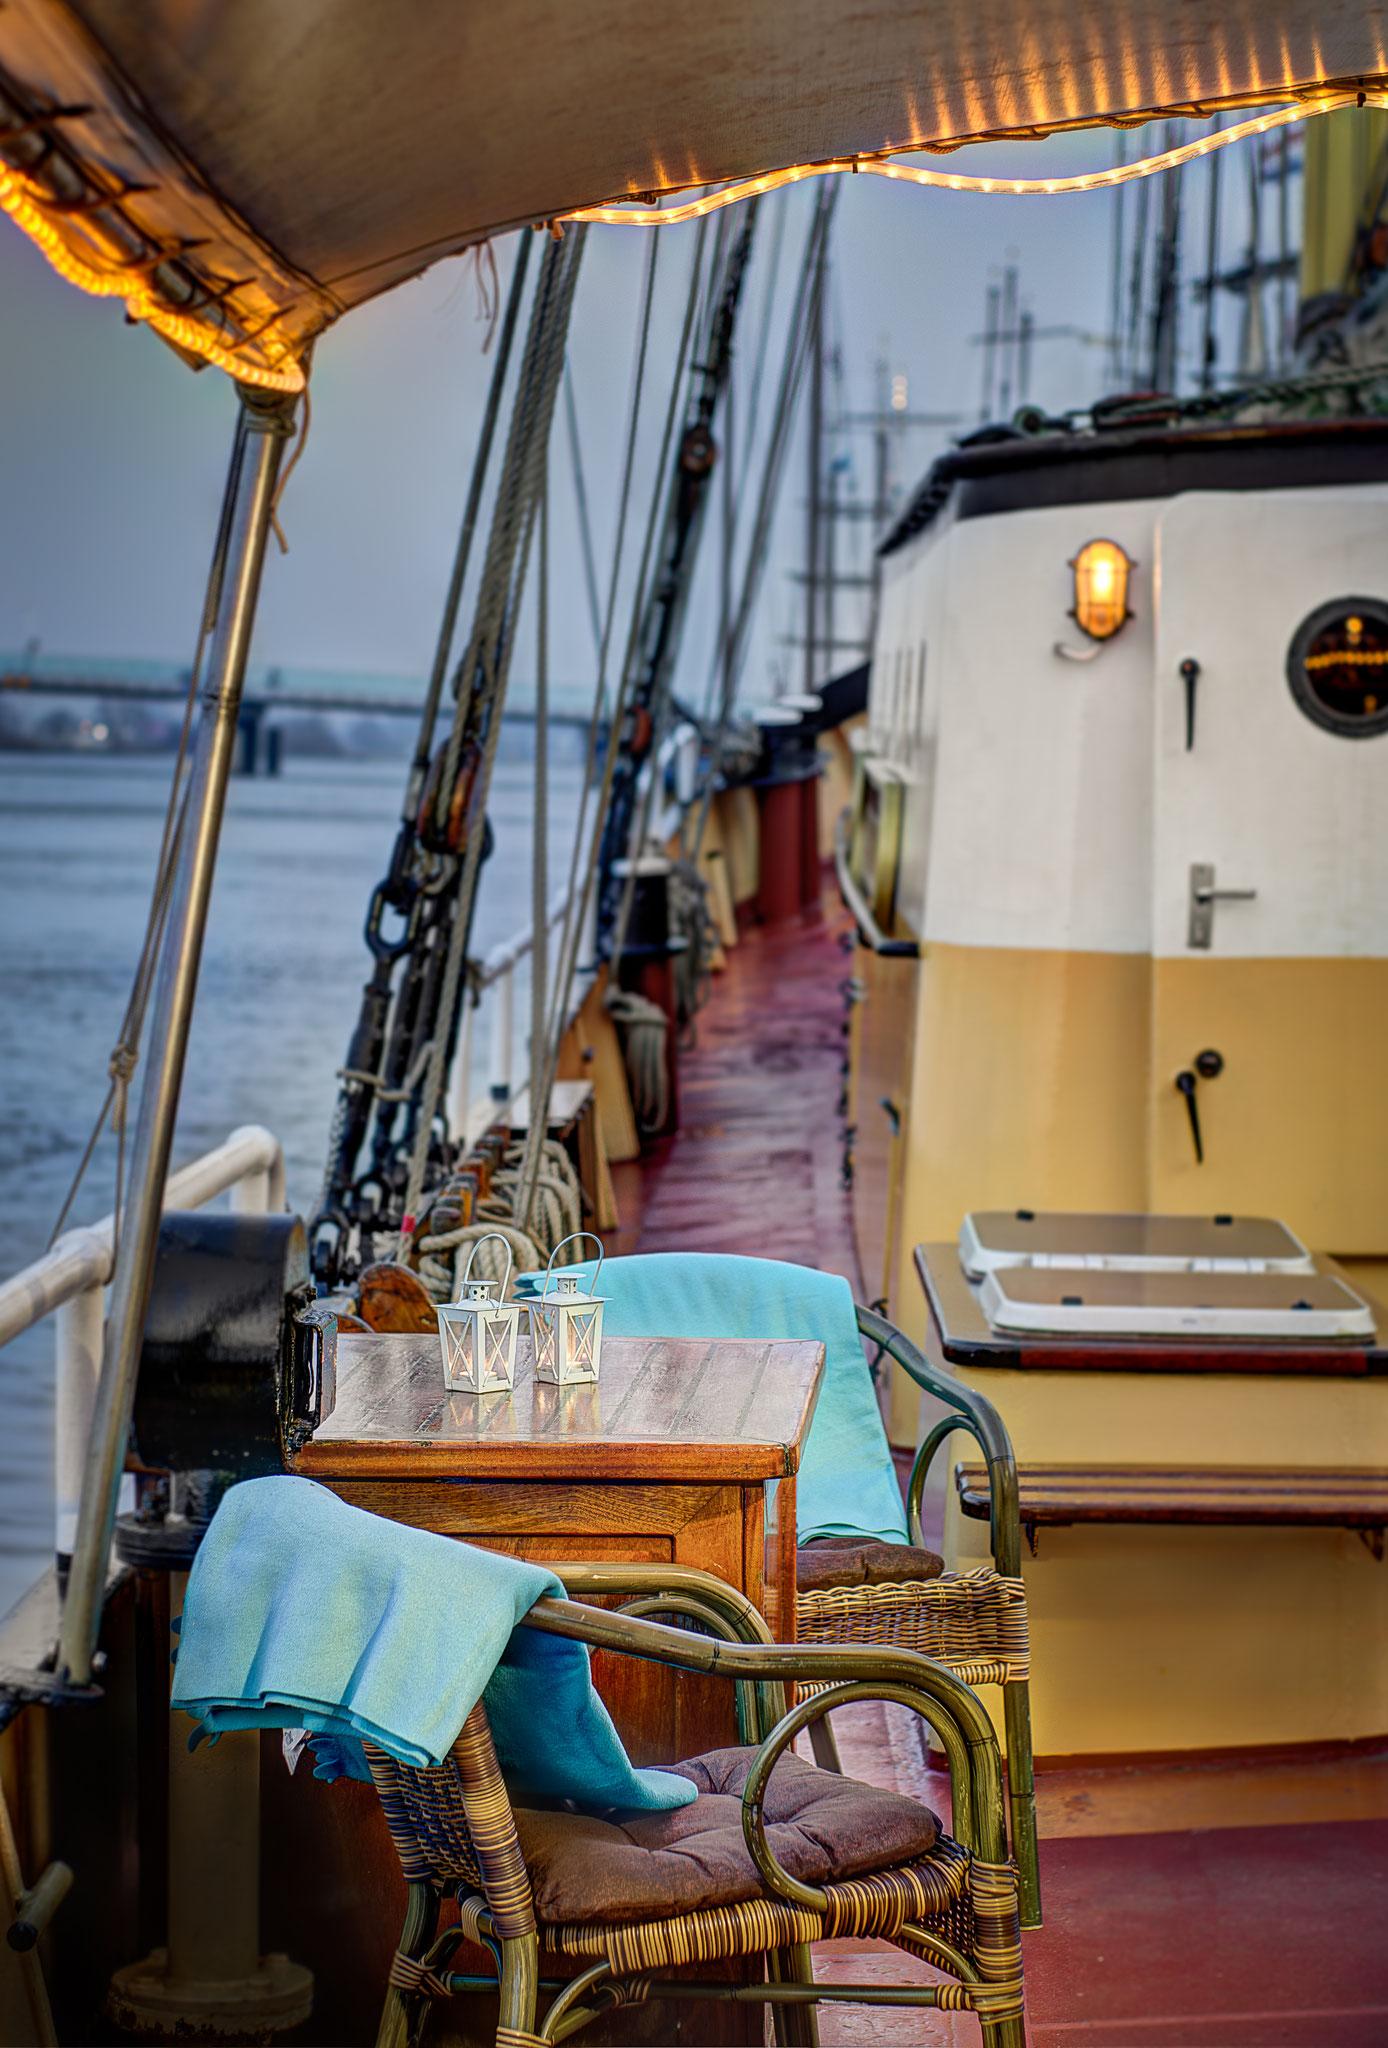 Sailingship Swaensborgh